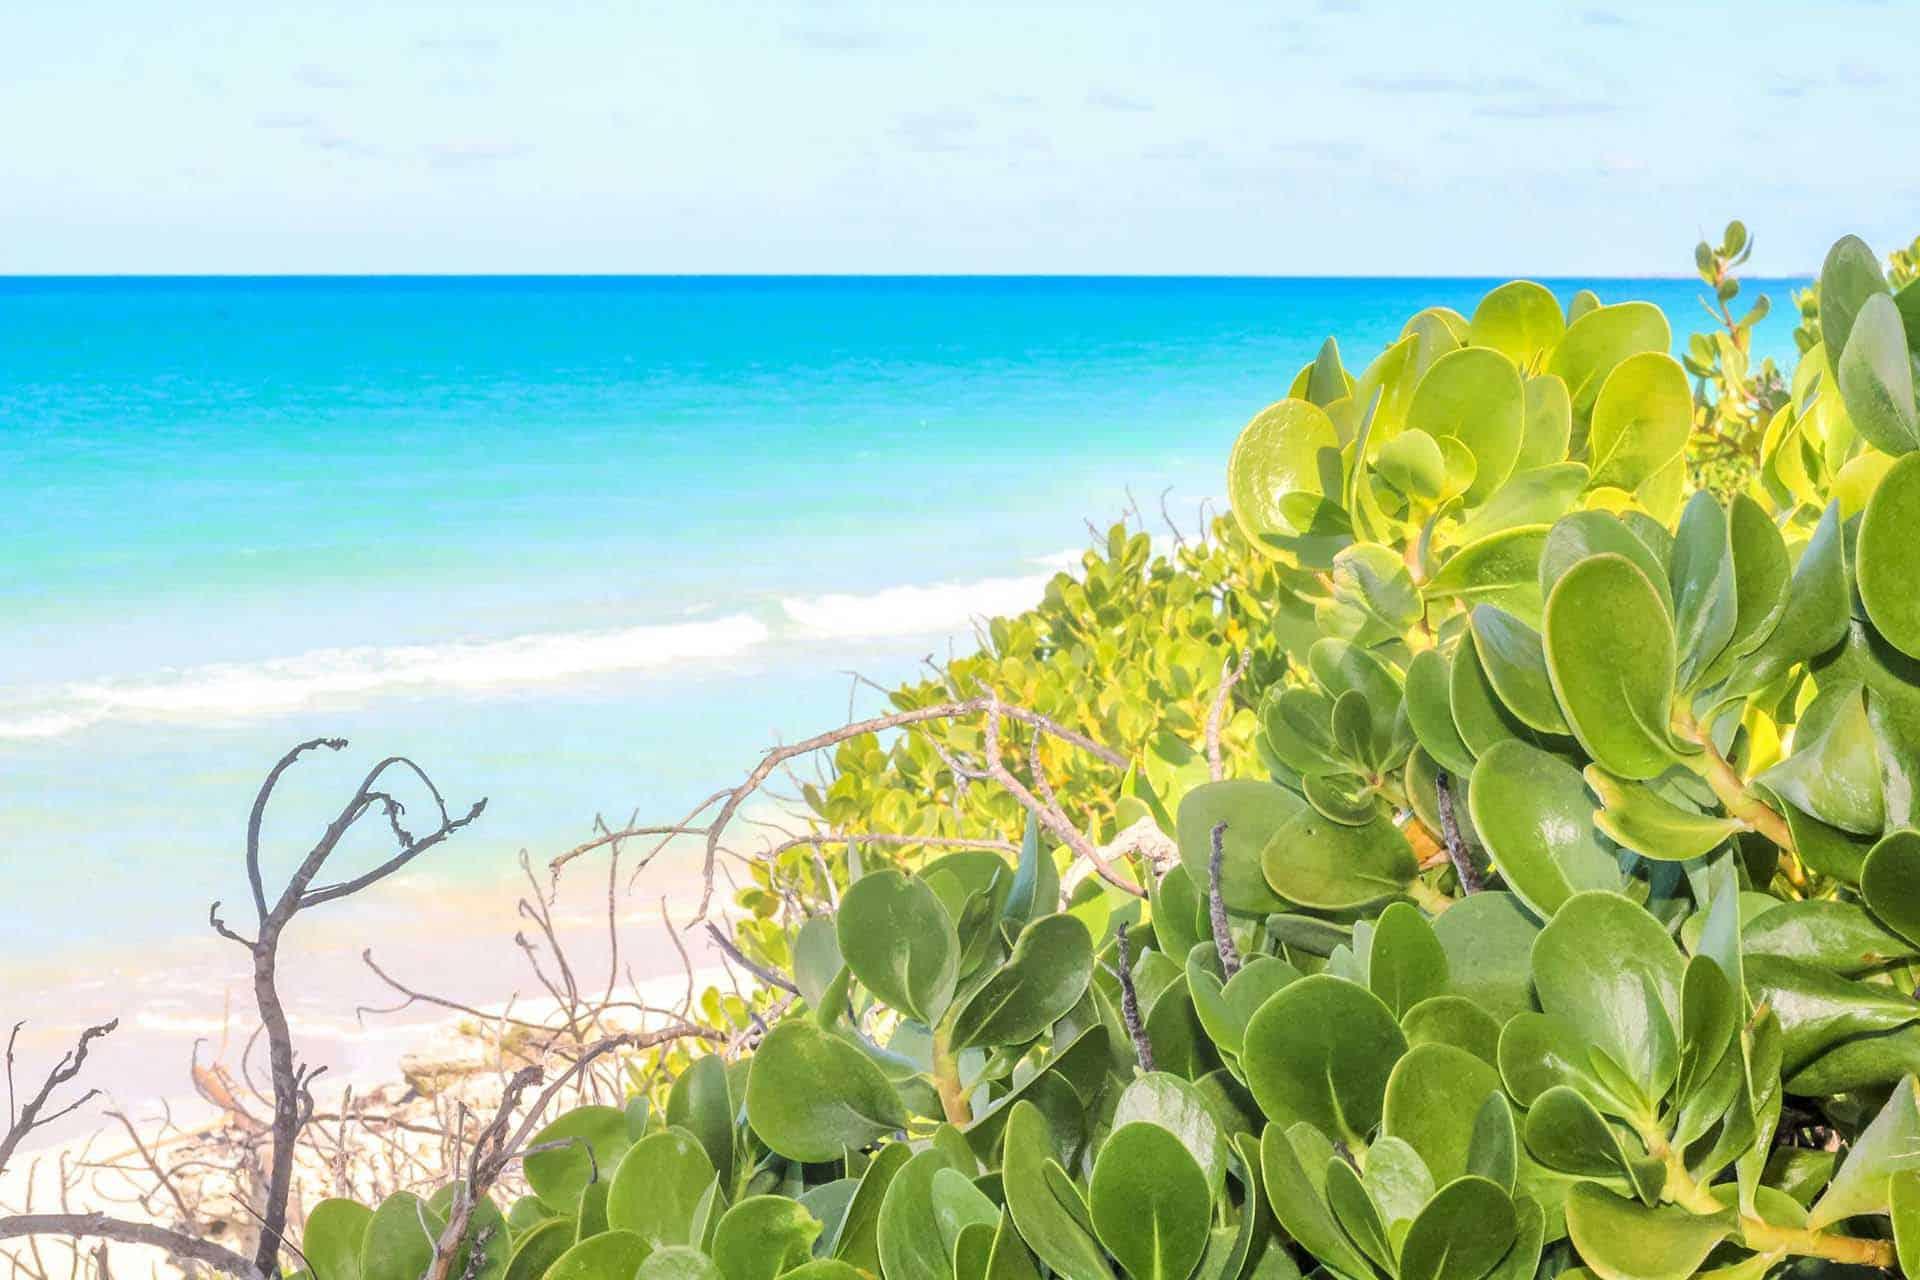 A0211 journee plage cayo santa maria 06 cuba autrement